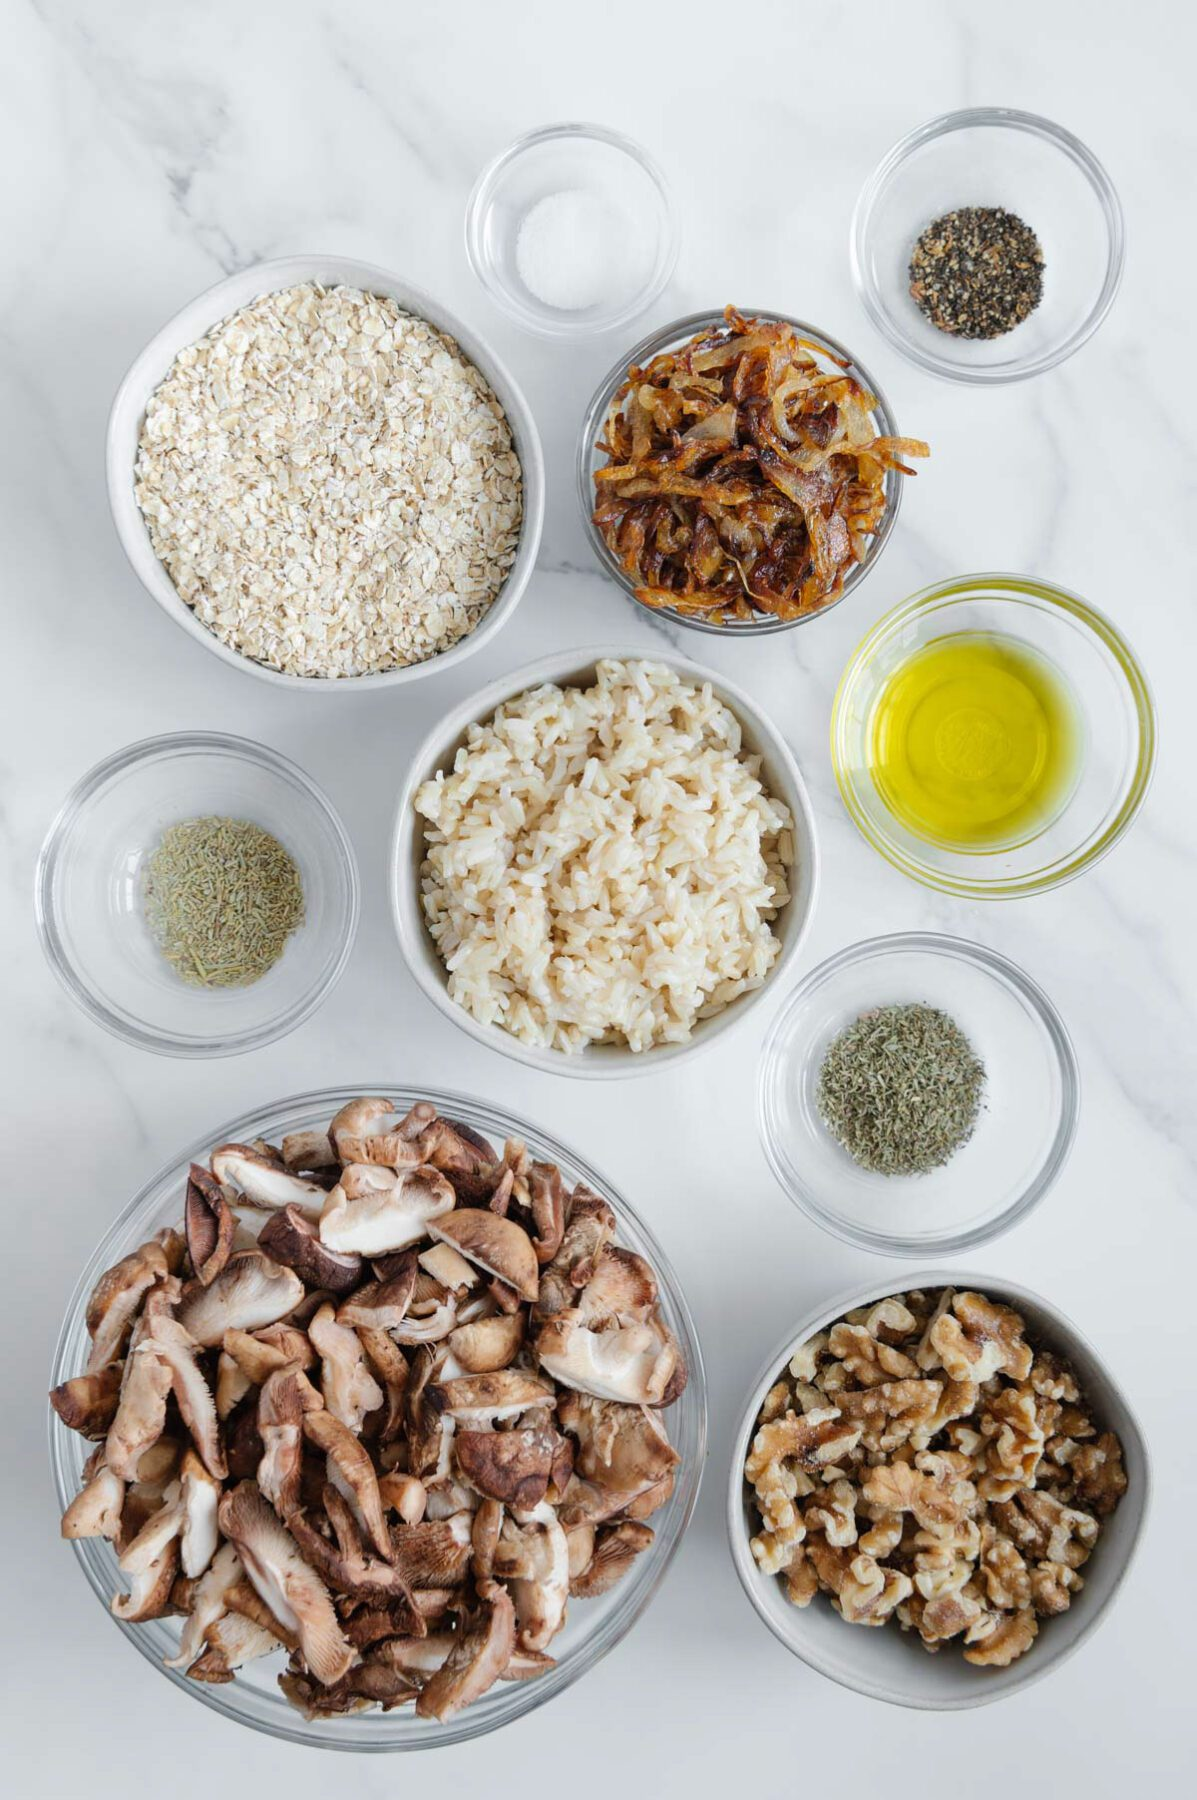 Mushroom-Walnut Balls Ingredients